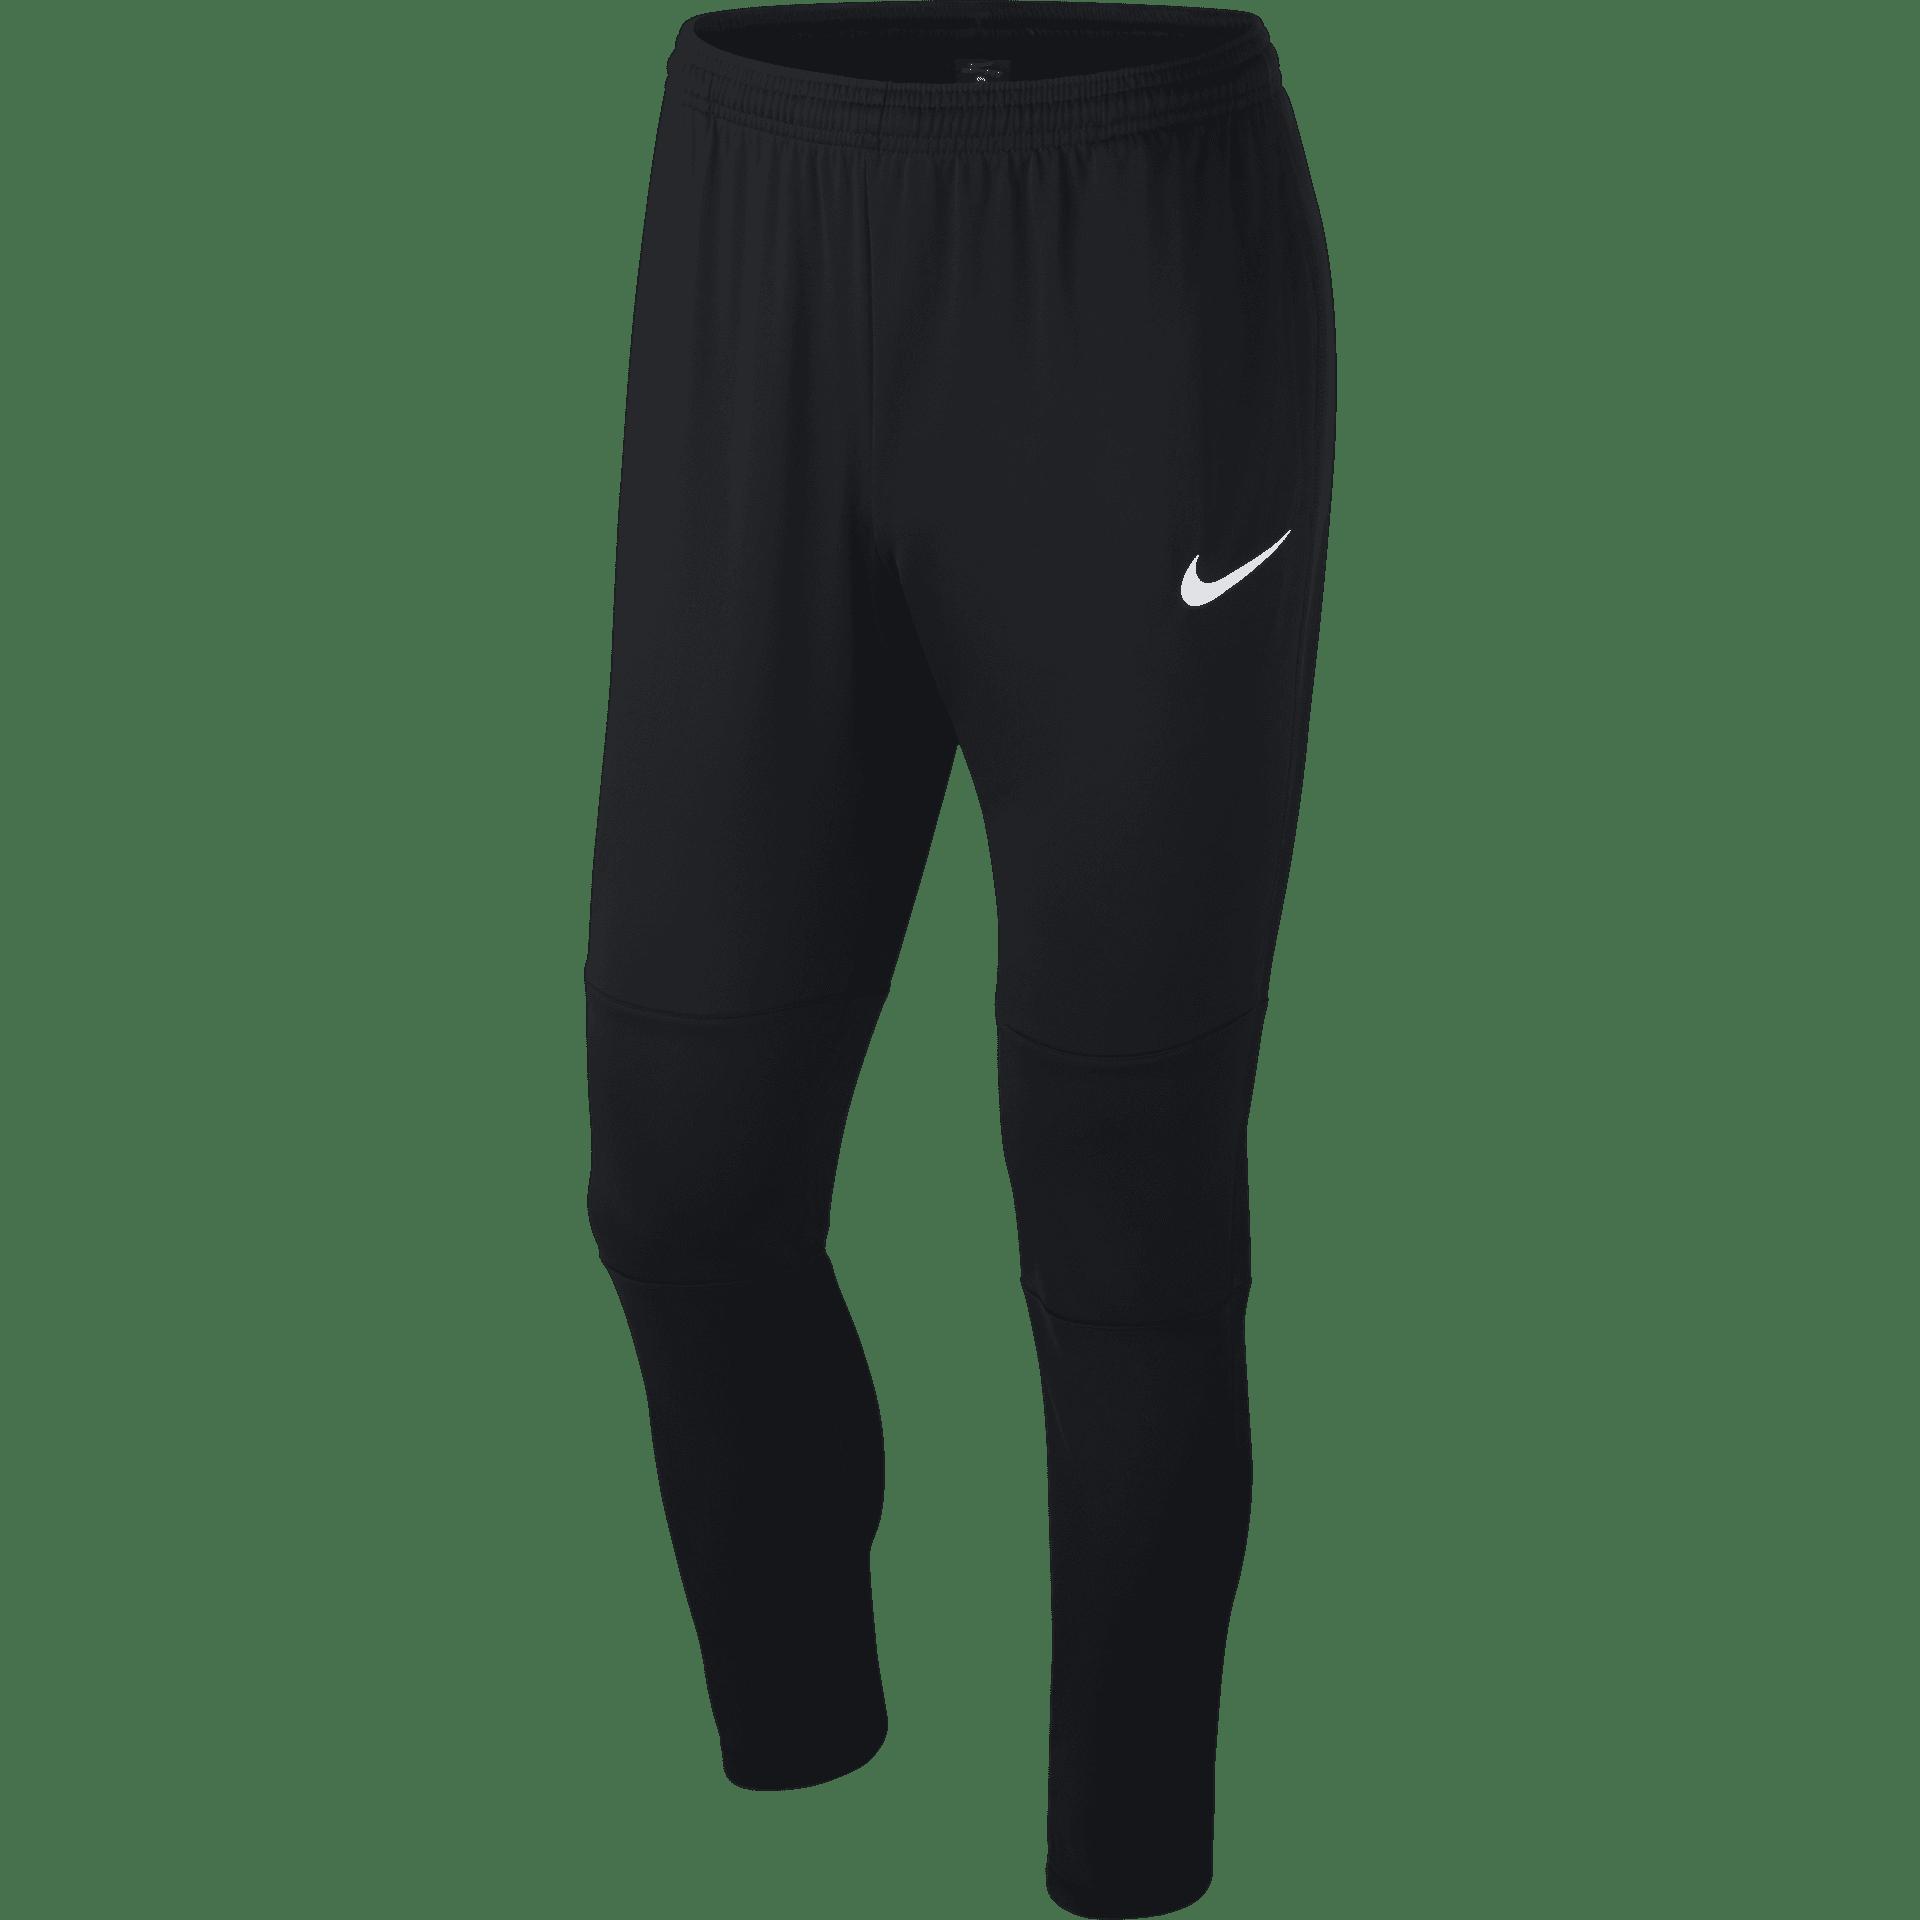 68th newtownabbey pants 33948 p